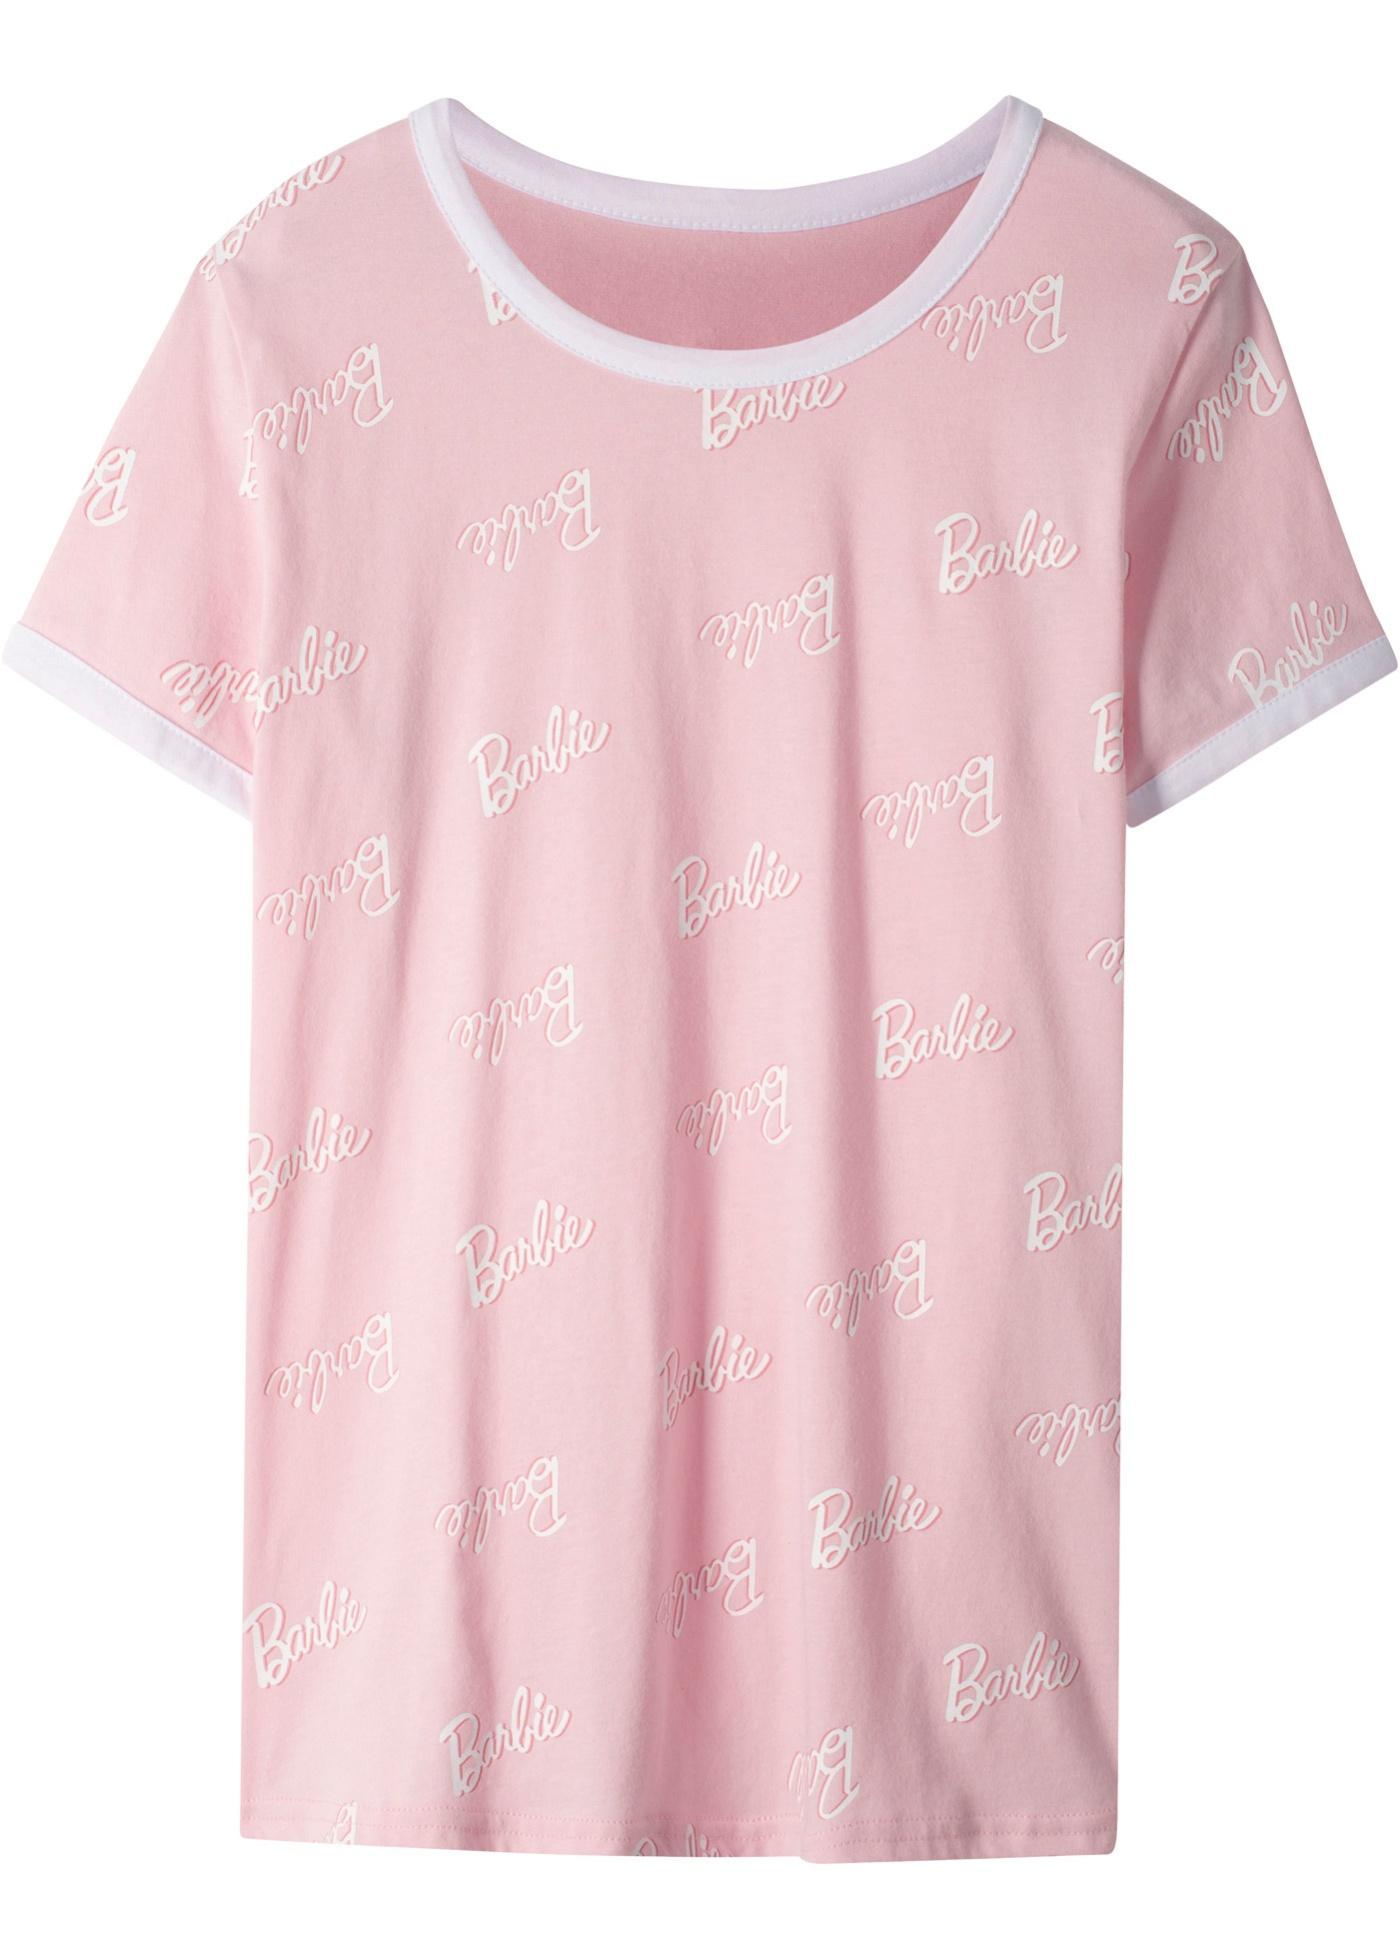 T-shirt BARBIE (rosa) - Barbie